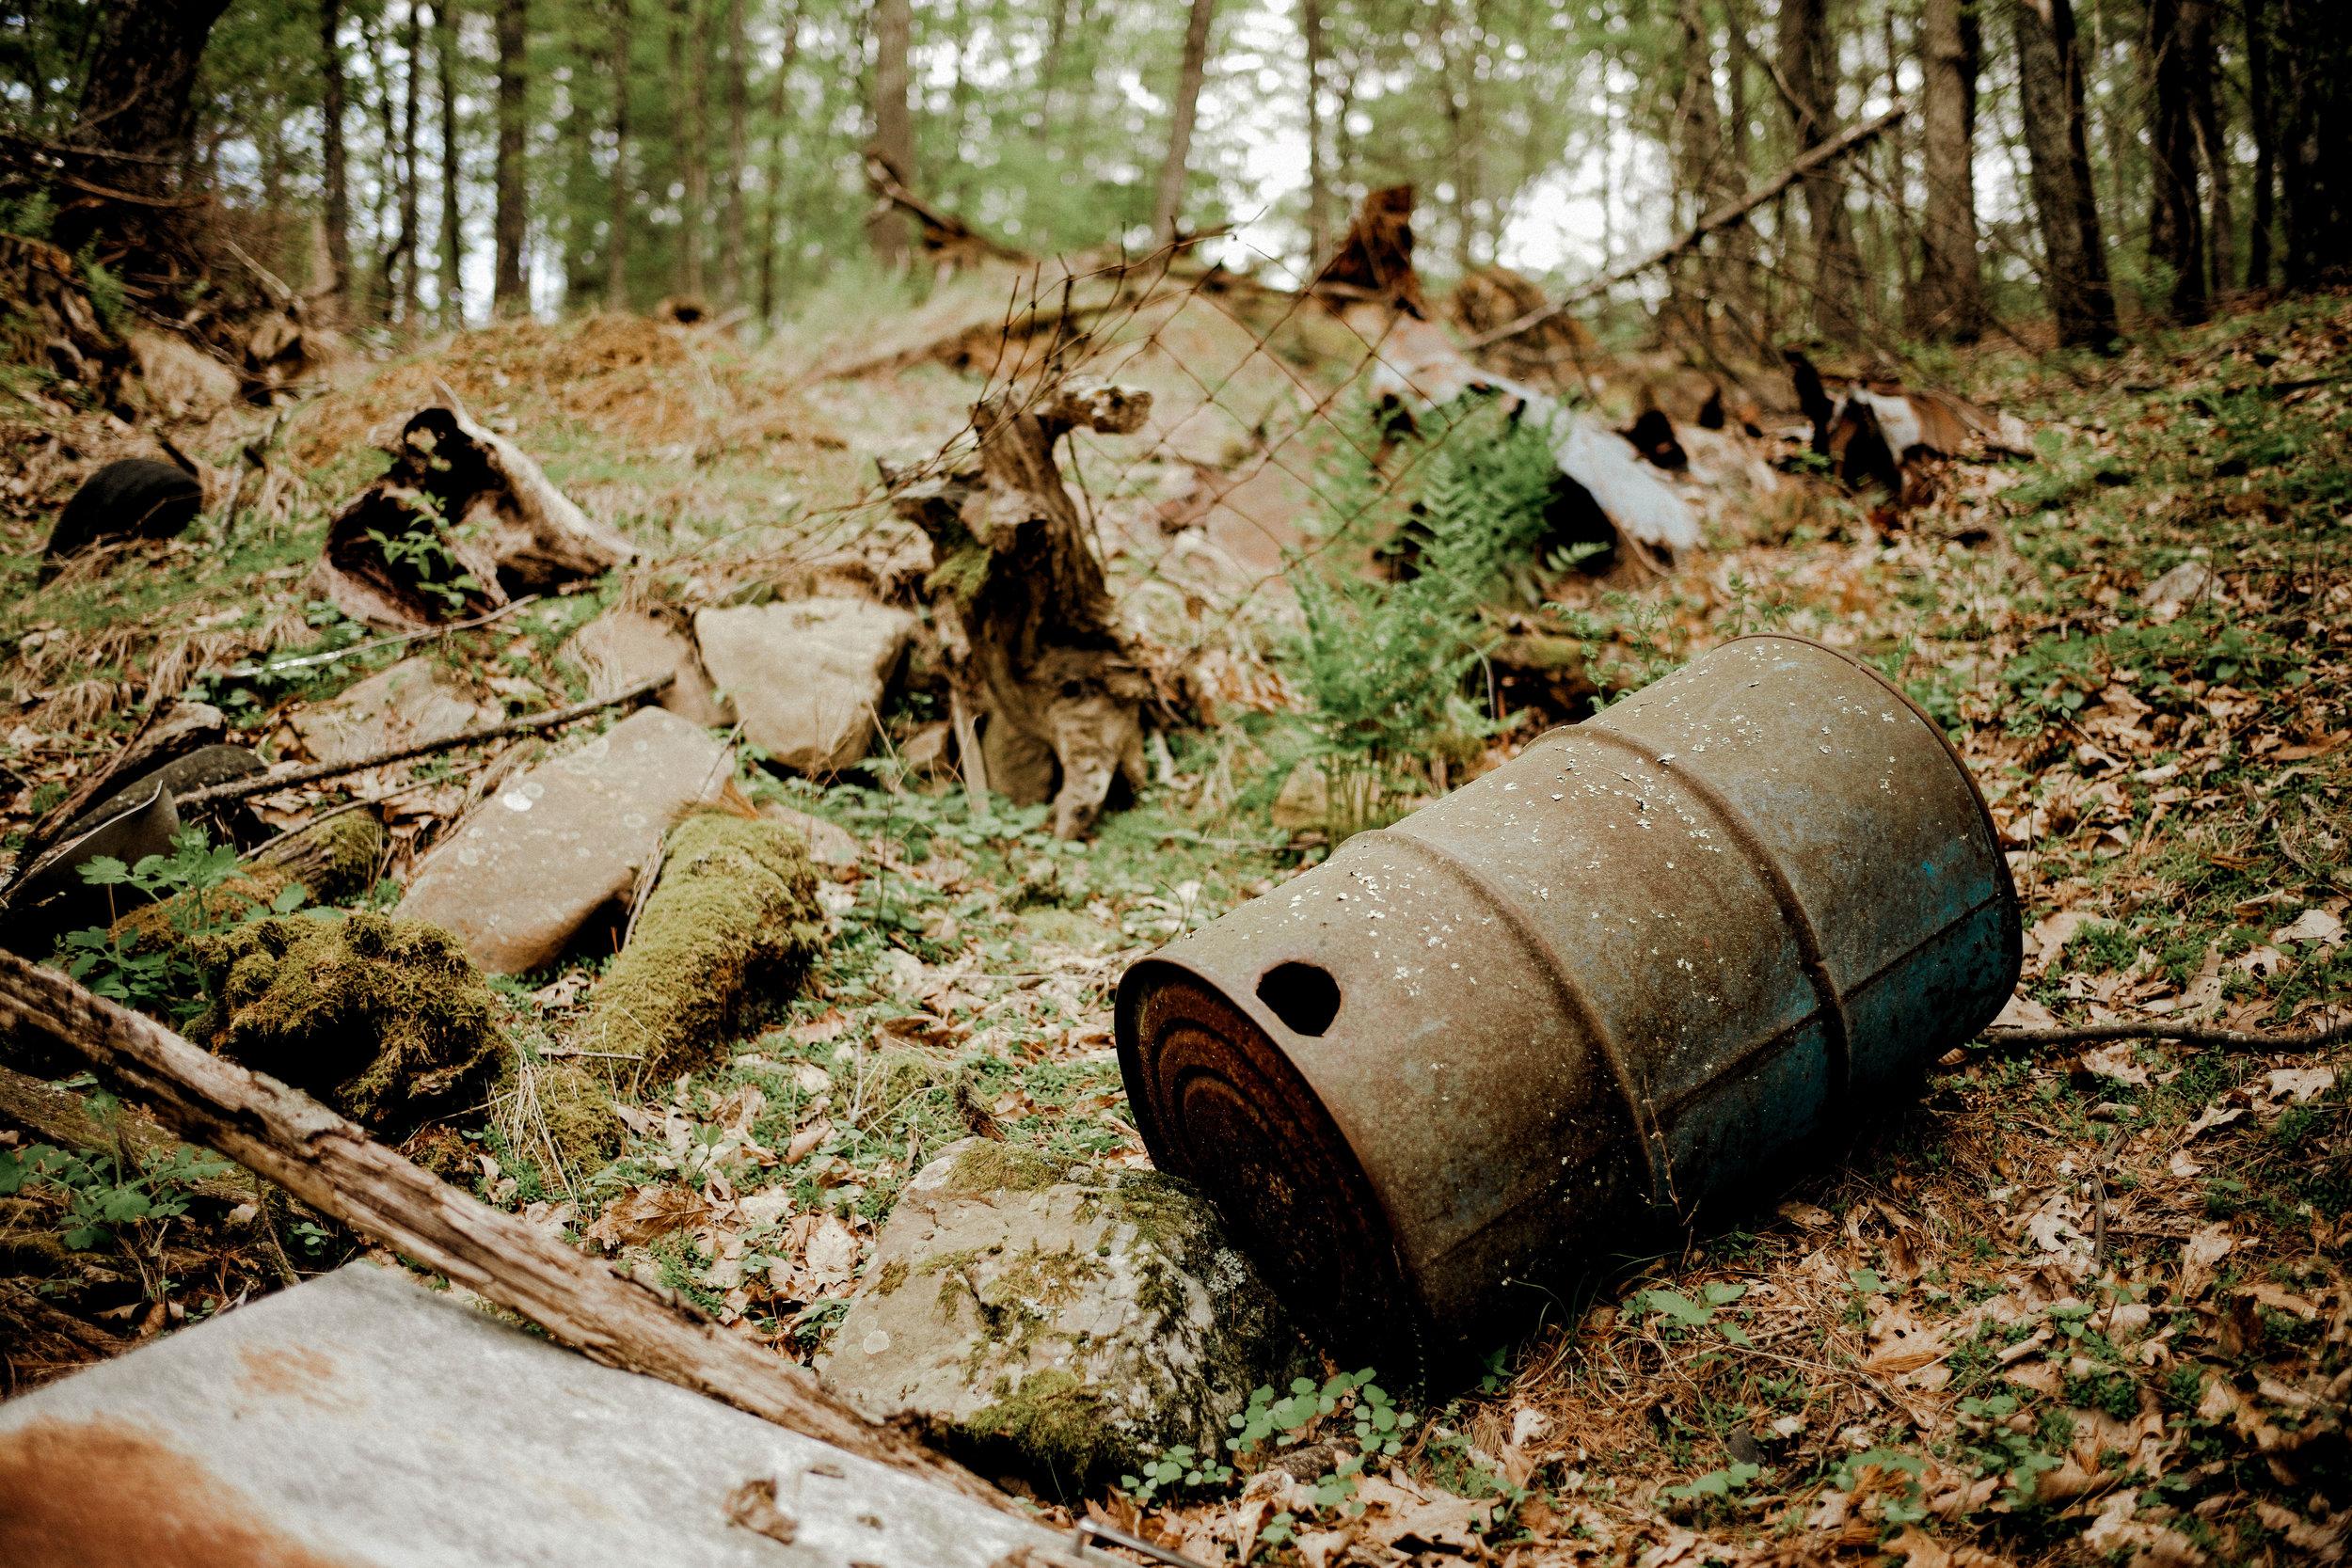 kw-forest-findings-img2.jpg